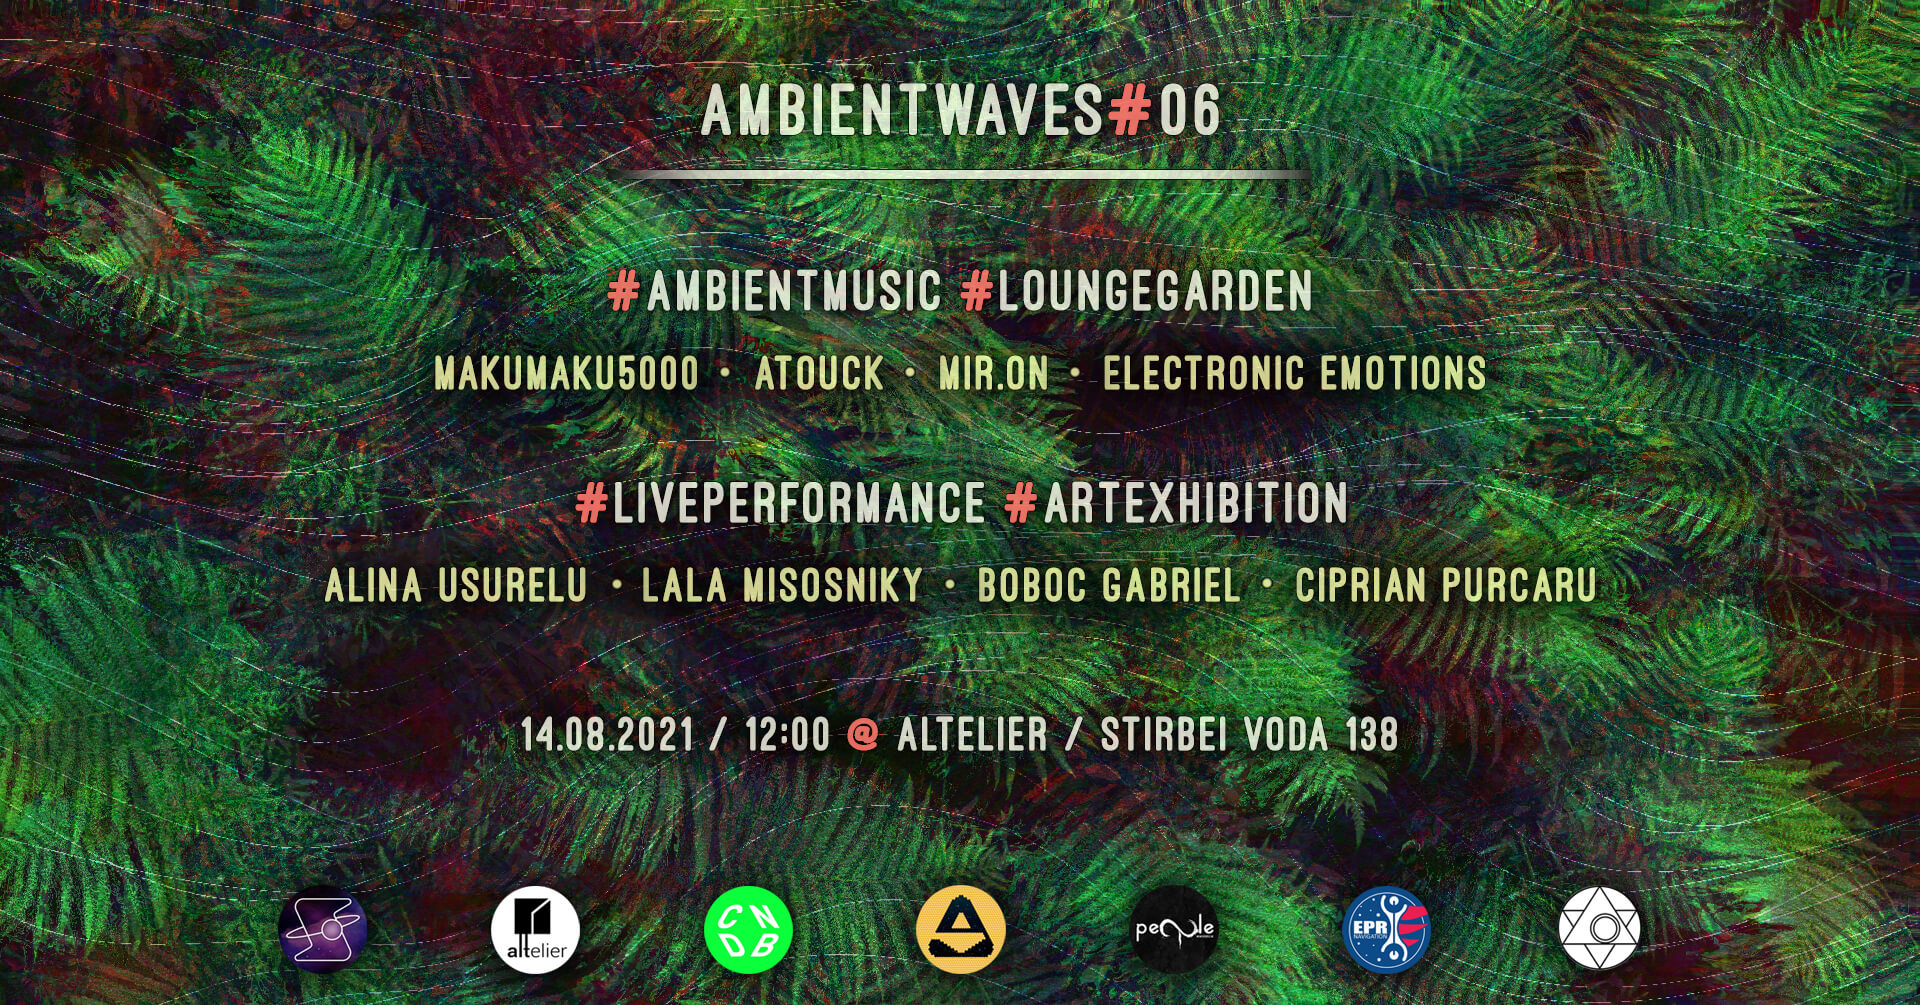 Soundsphere Ambientwaves 06 ALTelier